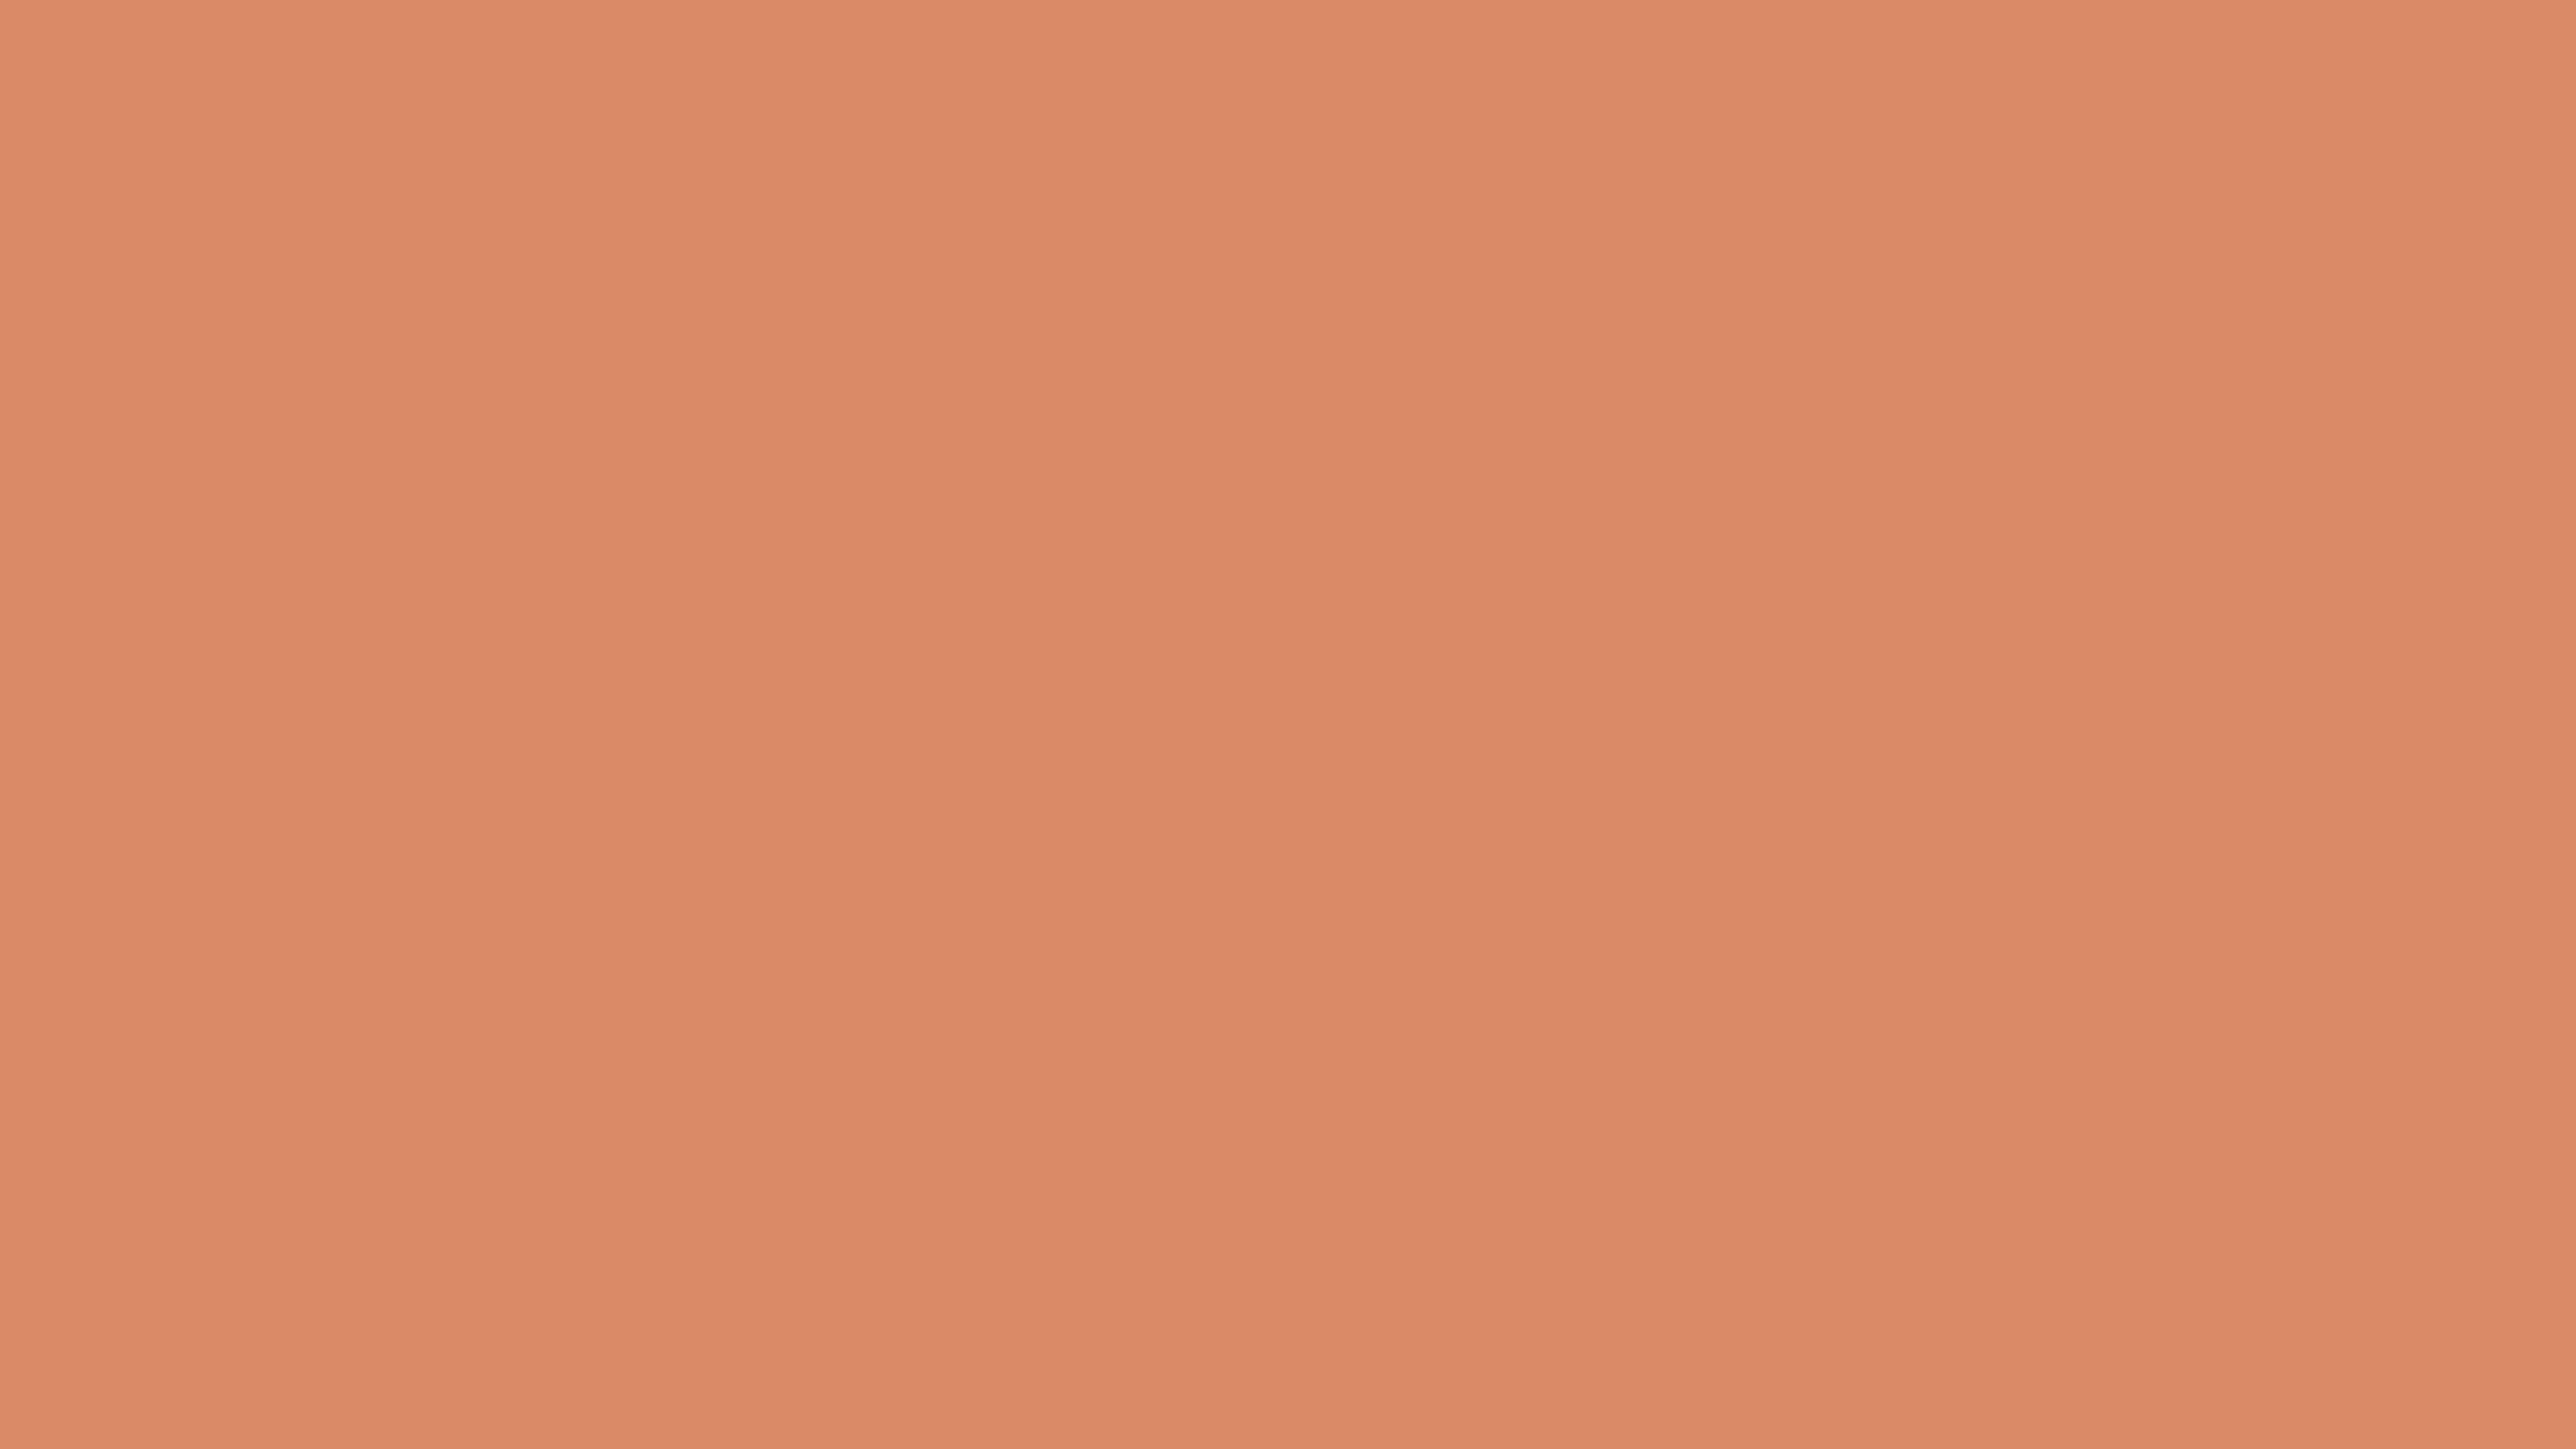 4096x2304 Copper Crayola Solid Color Background